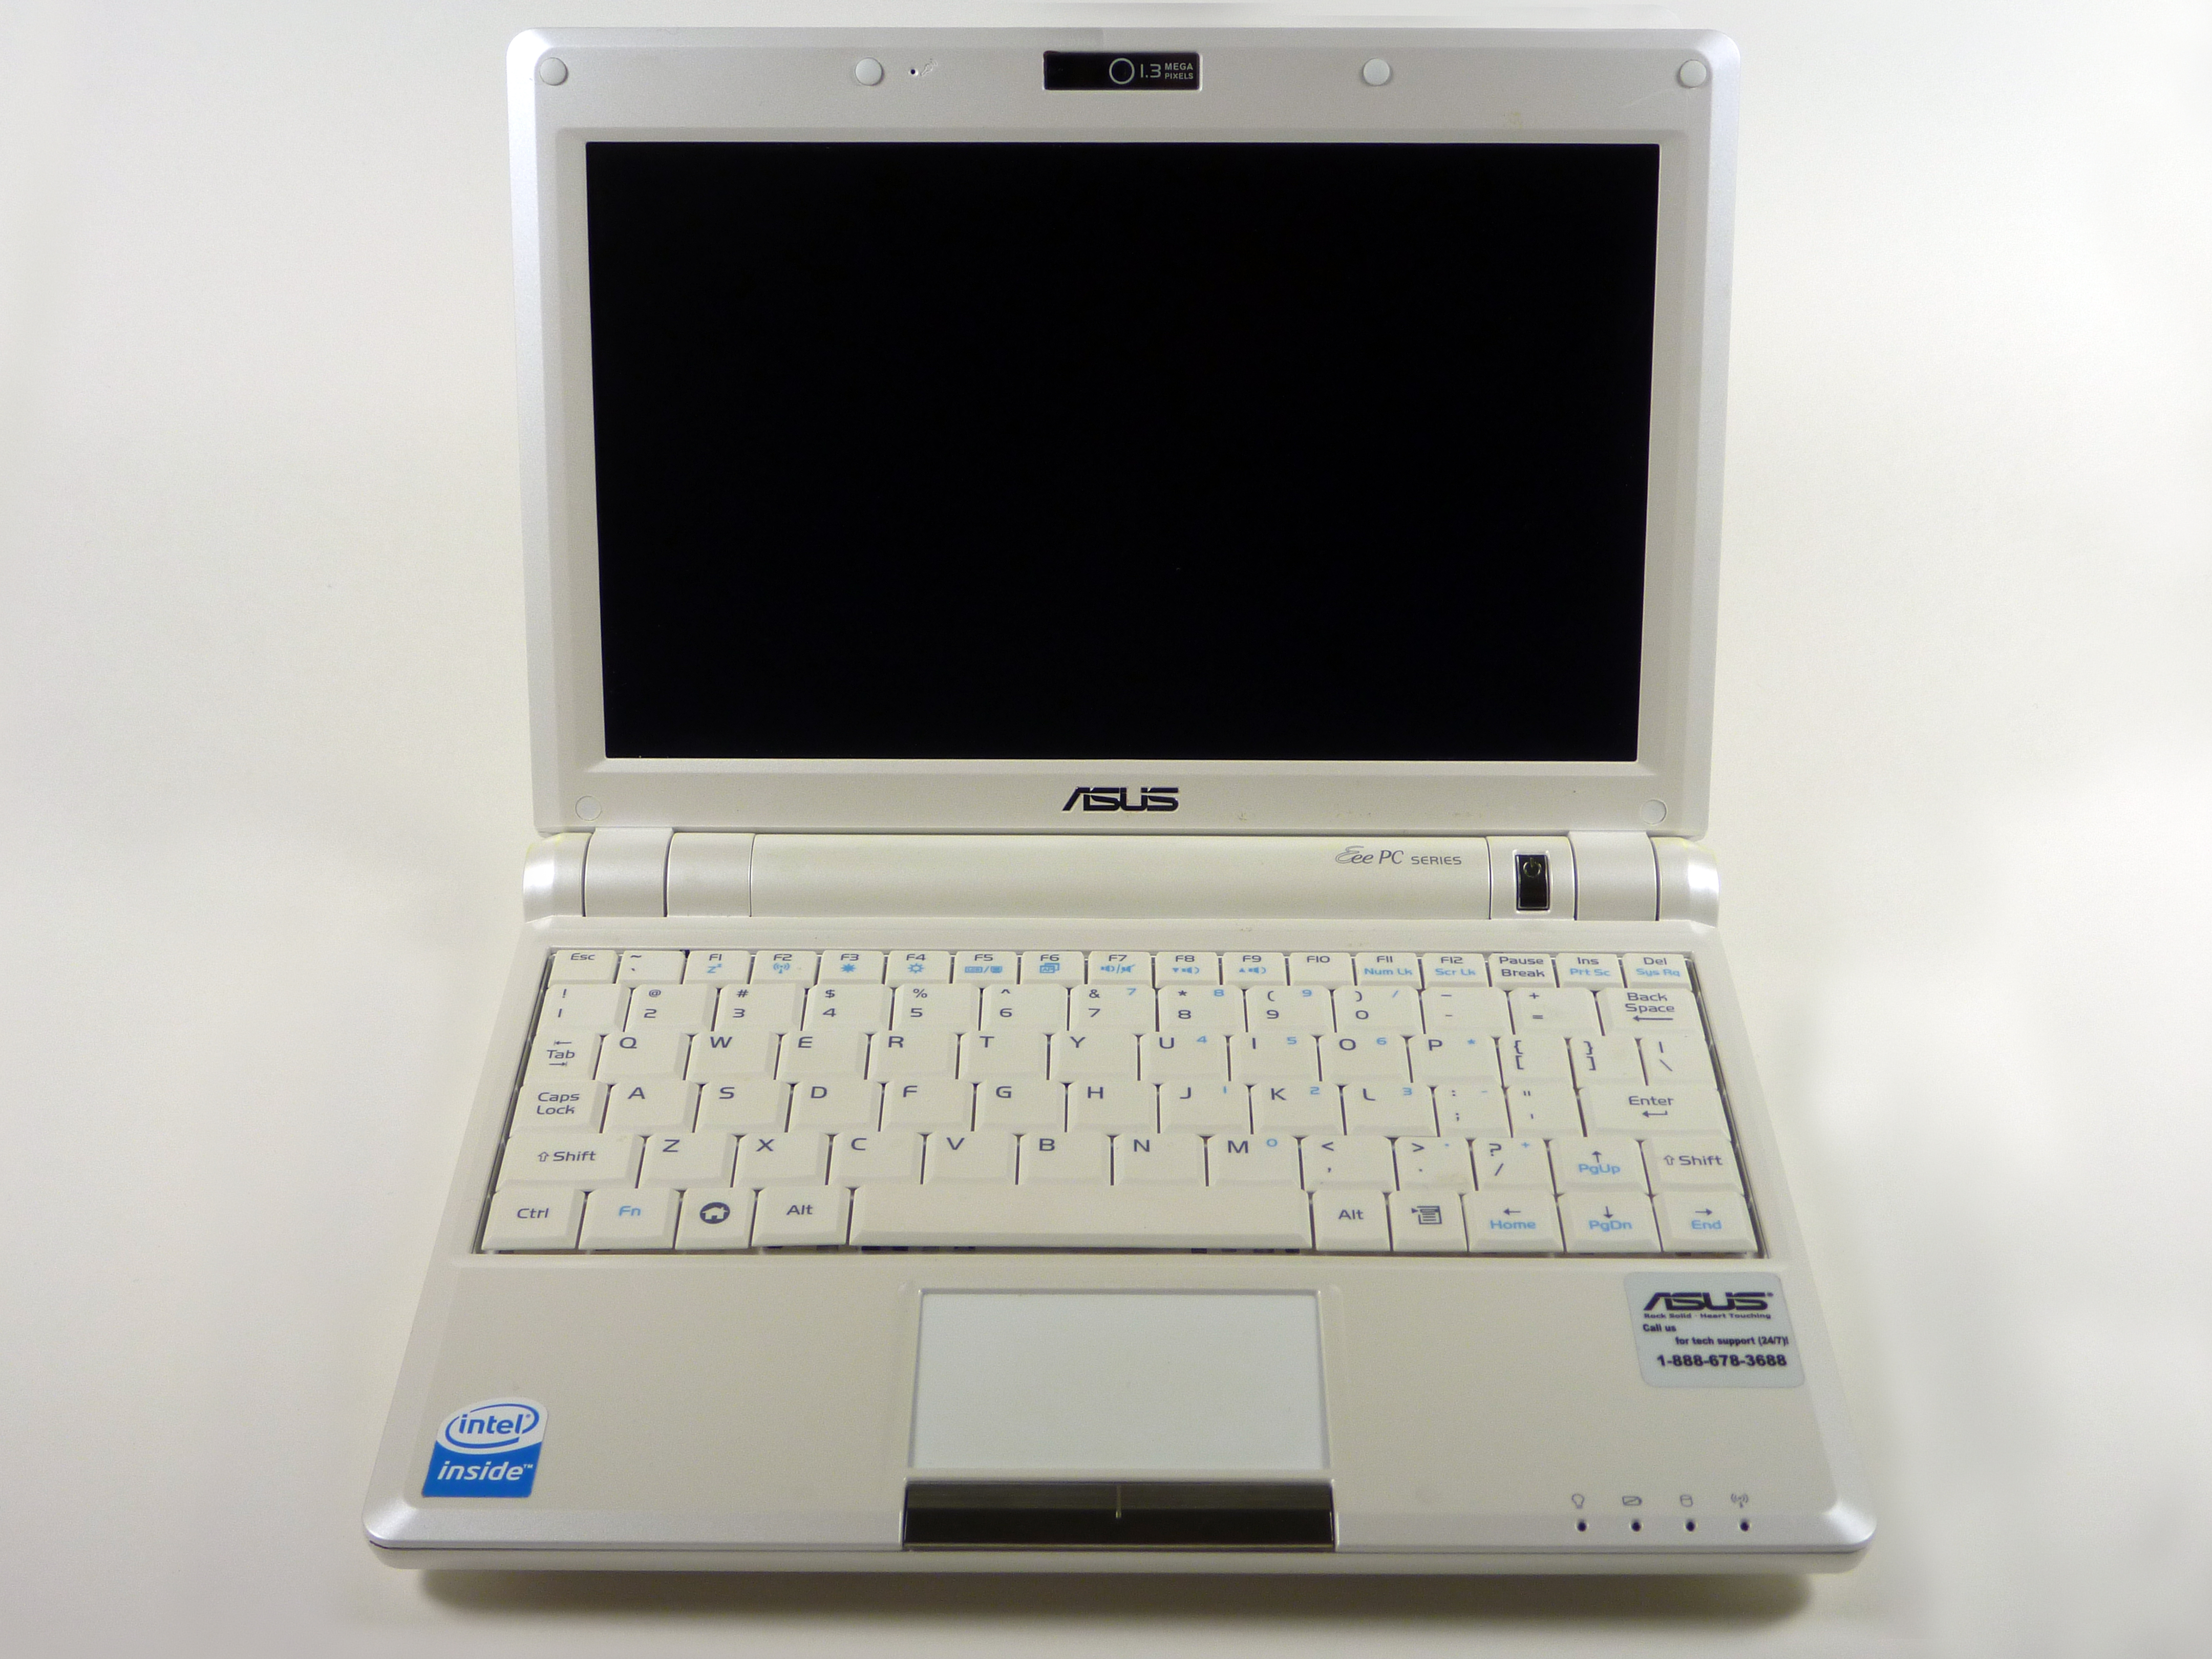 Asus Eee PC 900 LCD Display Screen Replacement